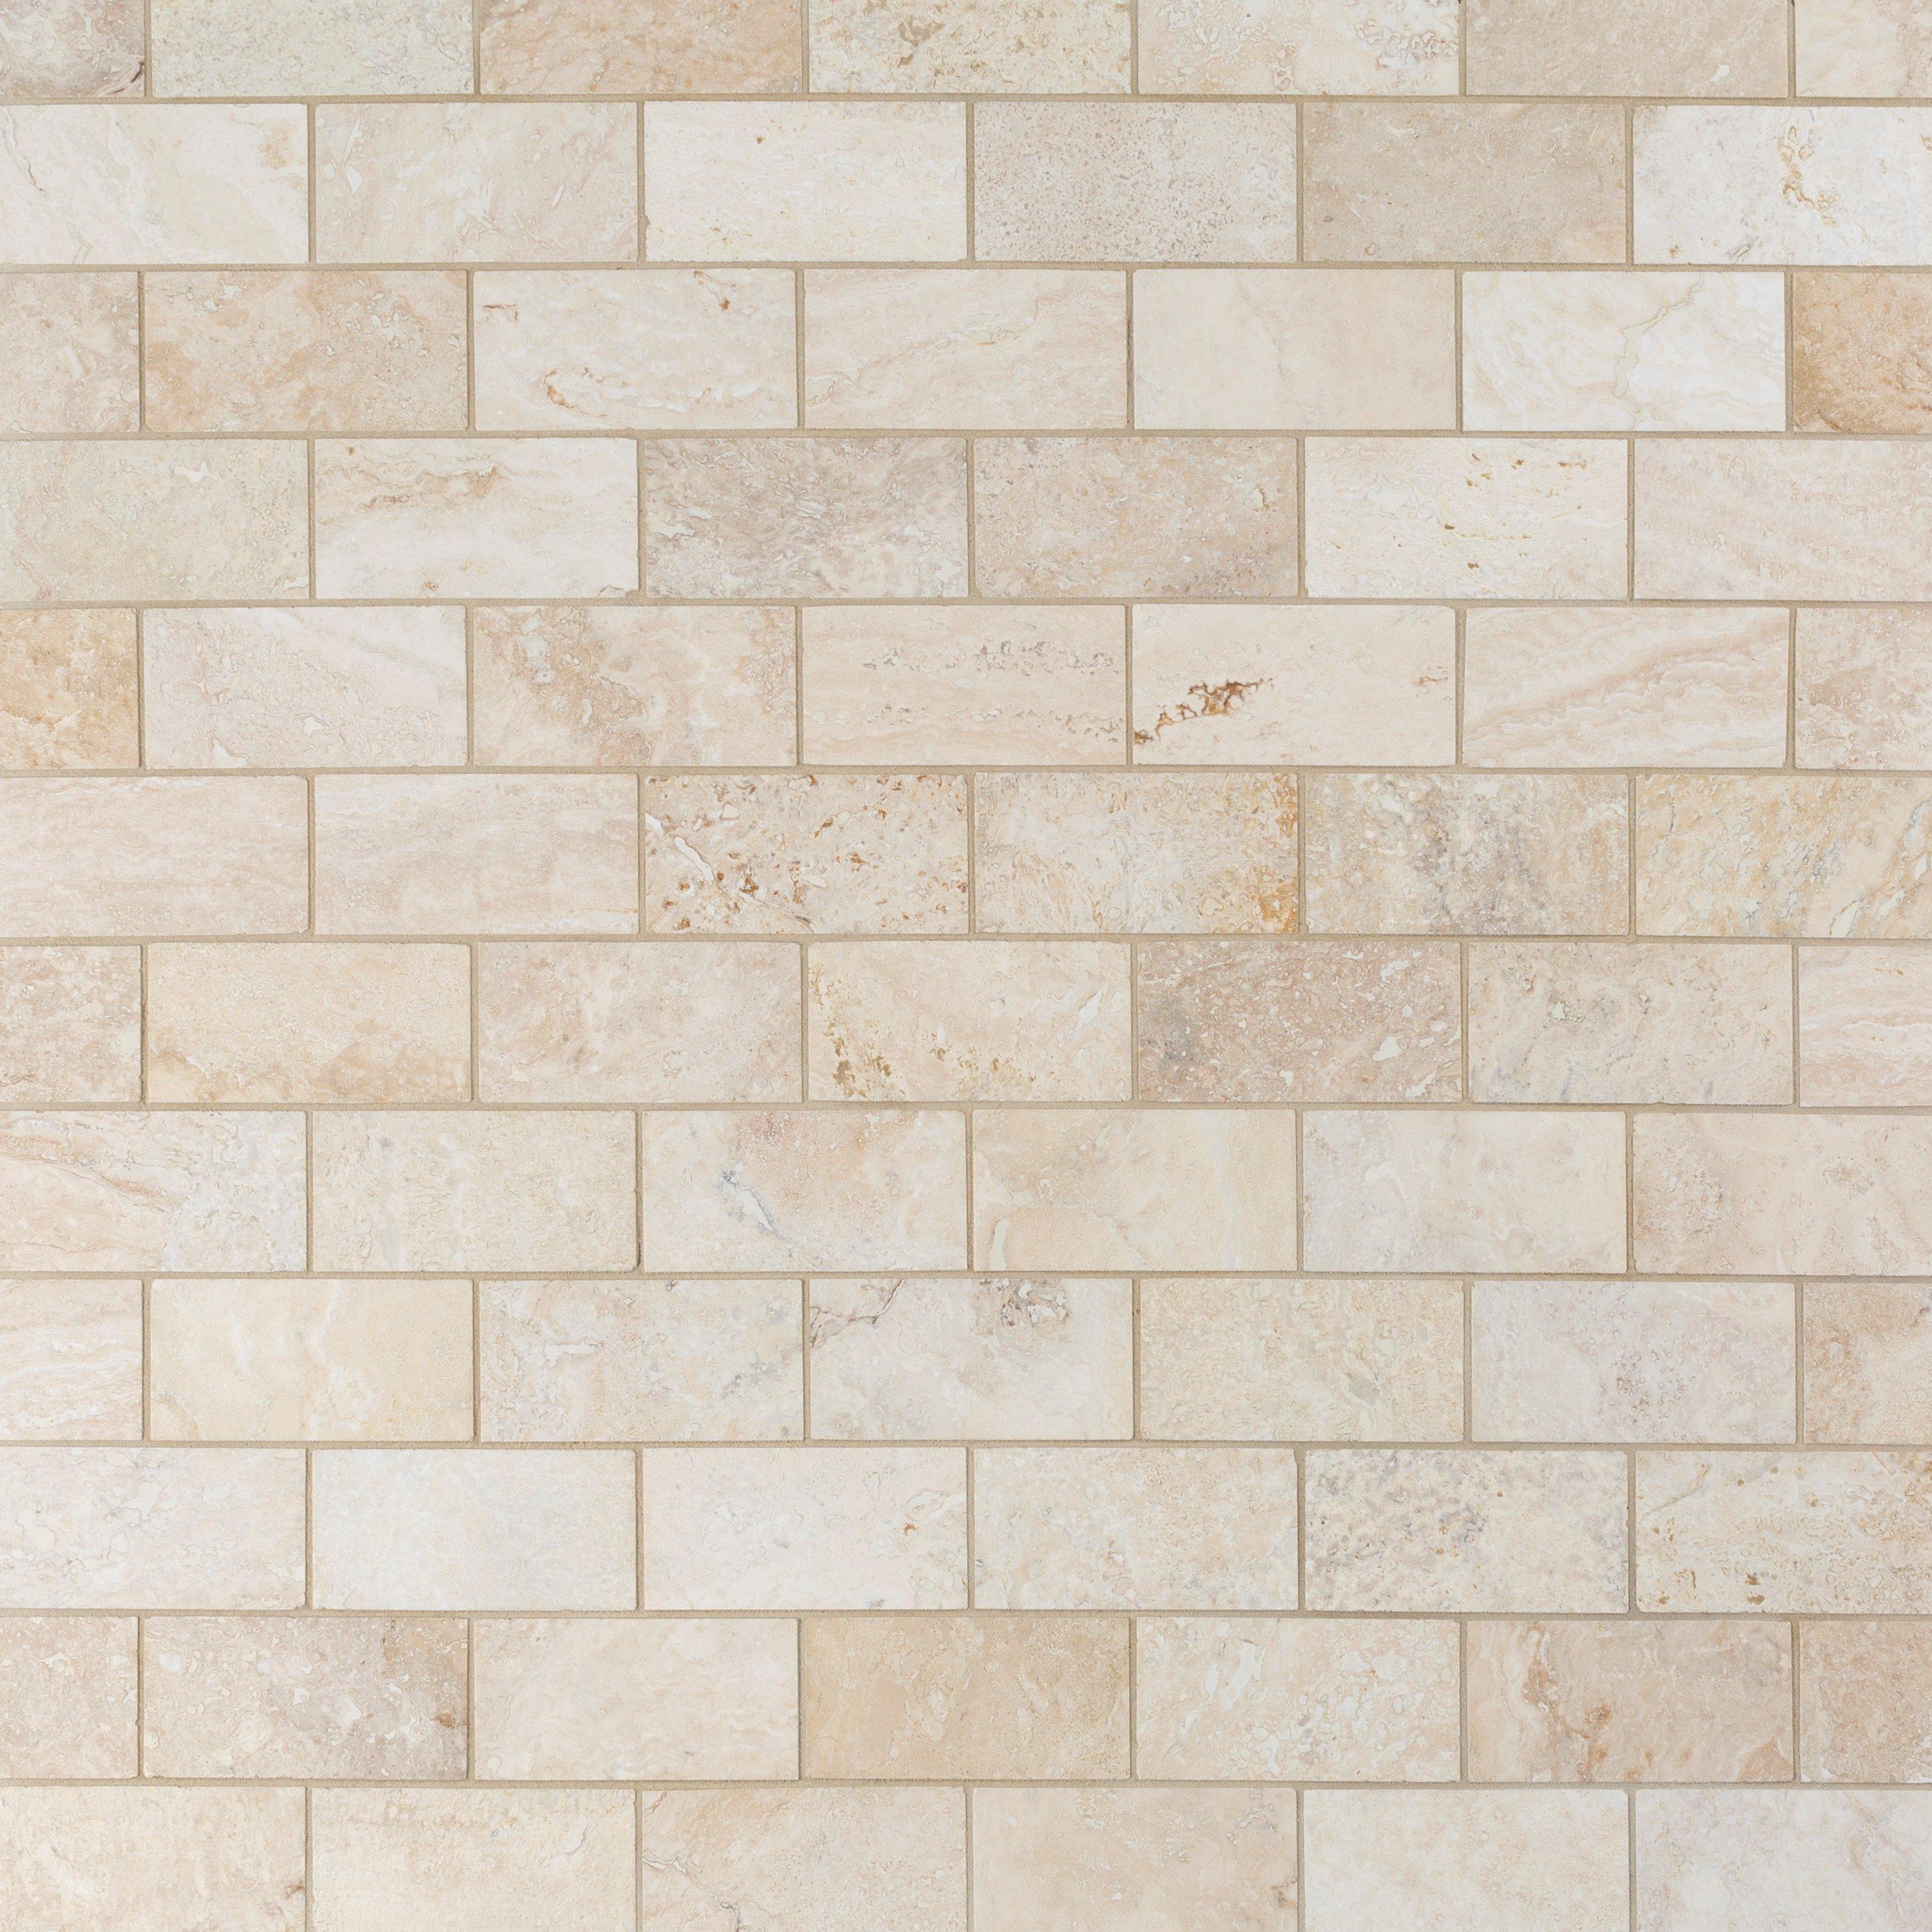 botticino marble tile 3 x 6